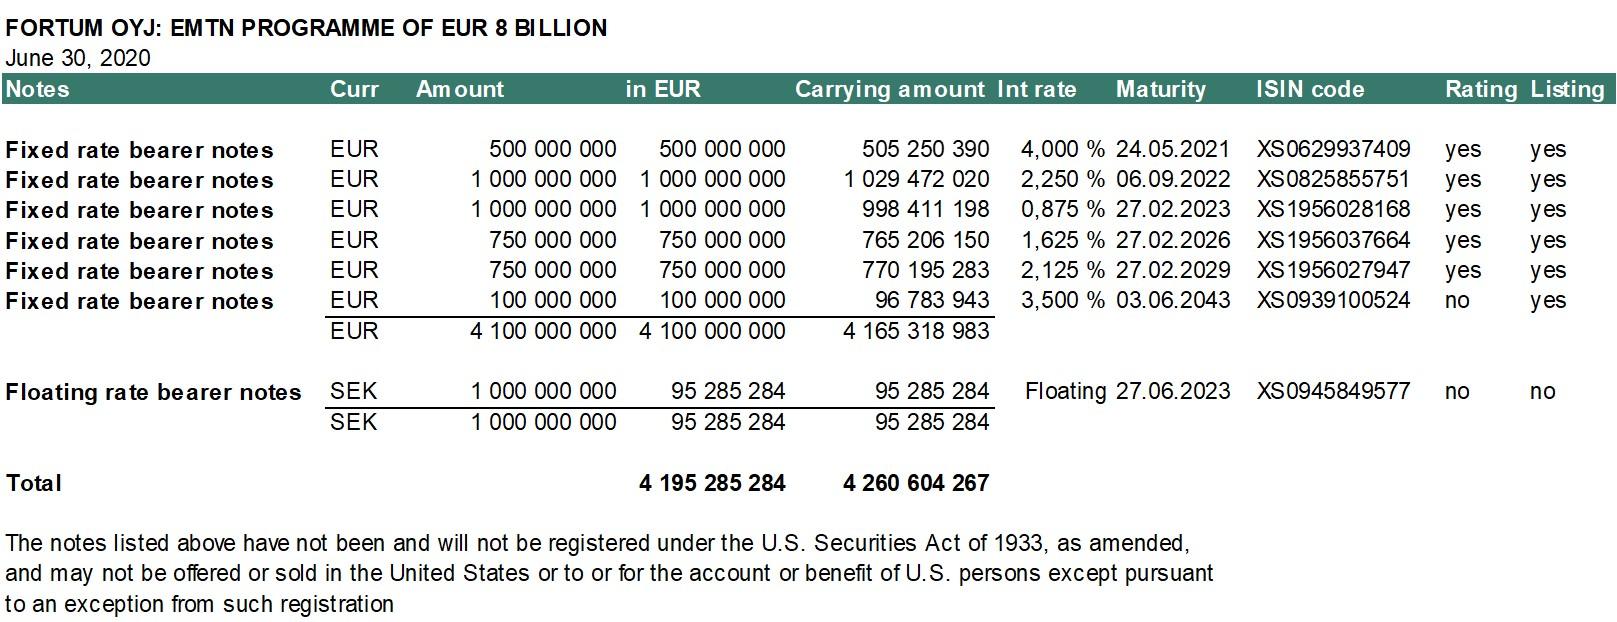 Bonds on 30 June 2020